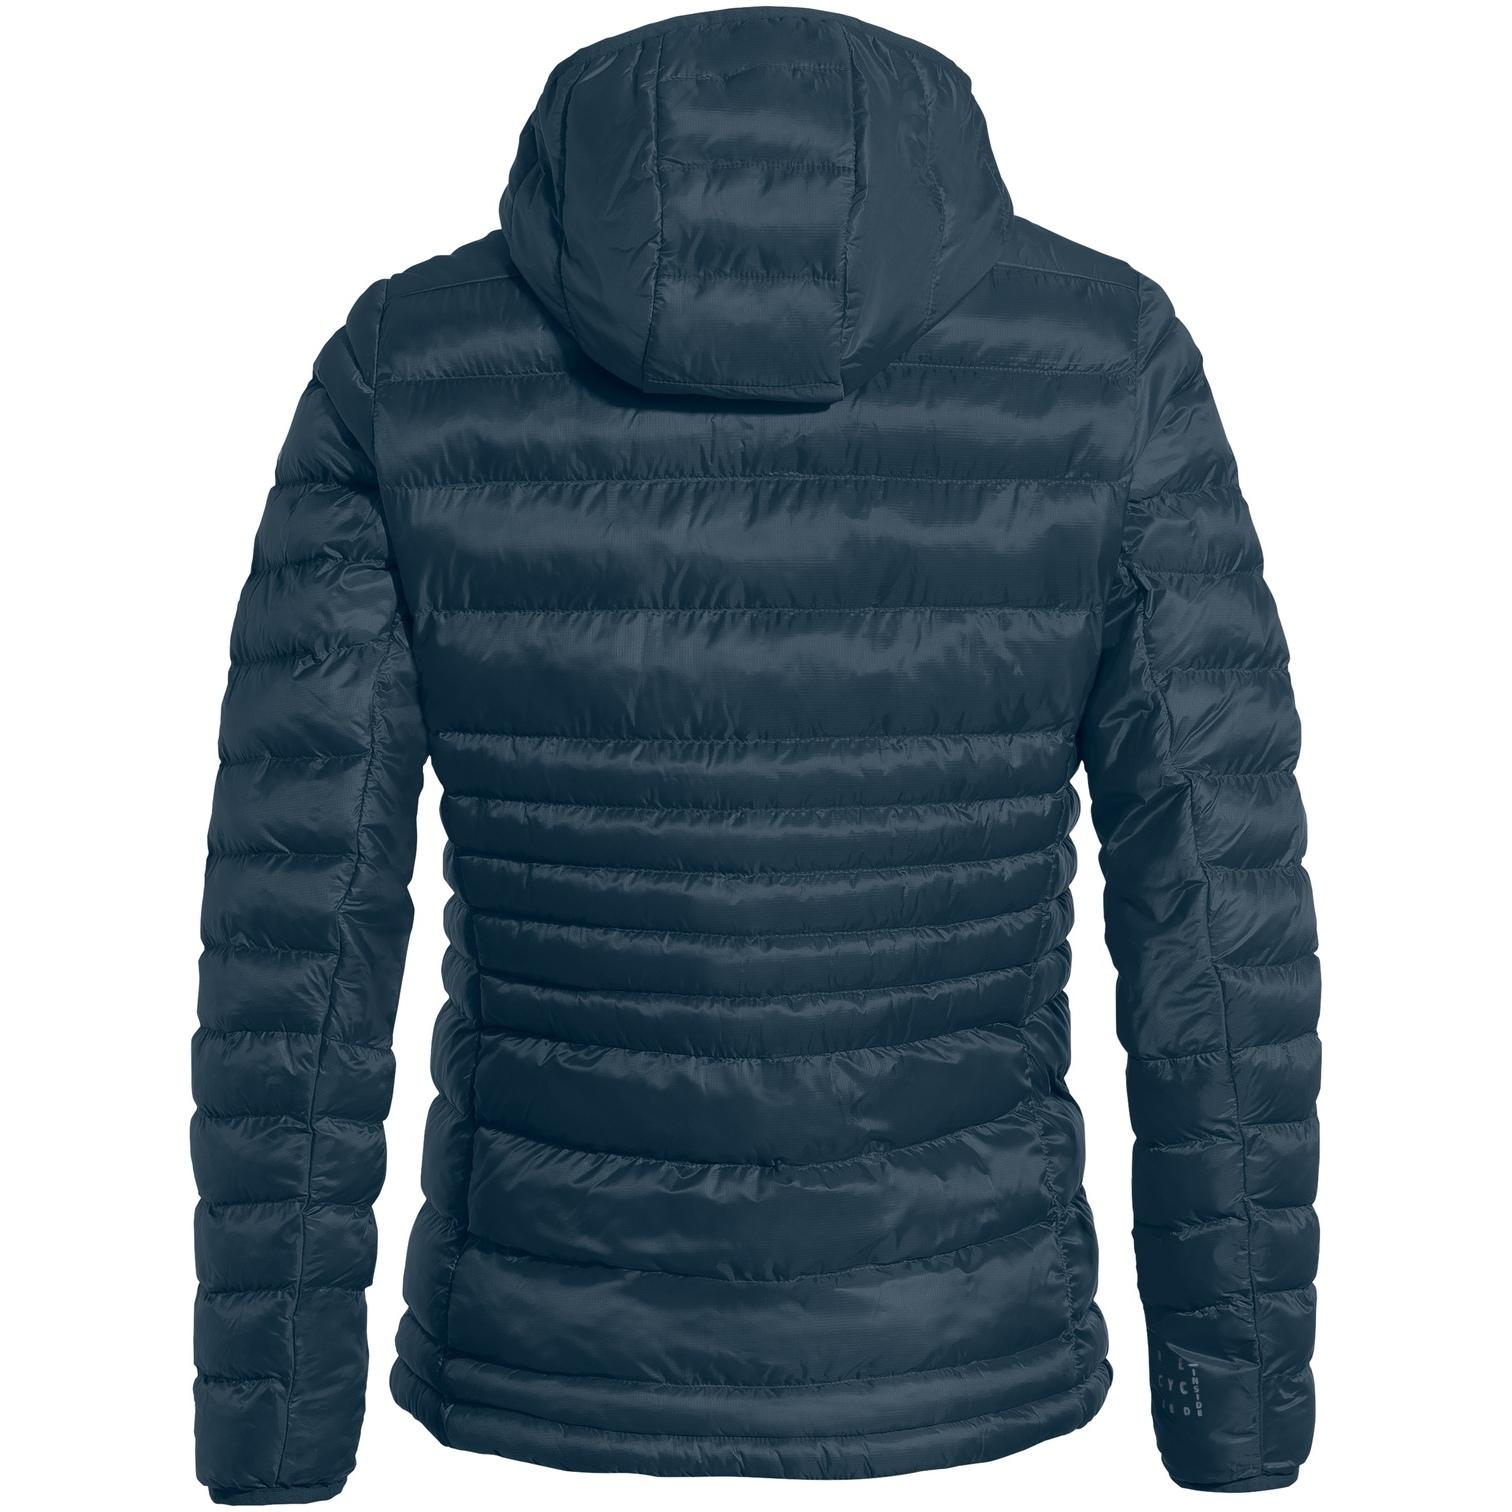 Image of Vaude Women's Batura Hooded Insulation Jacket - dark sea